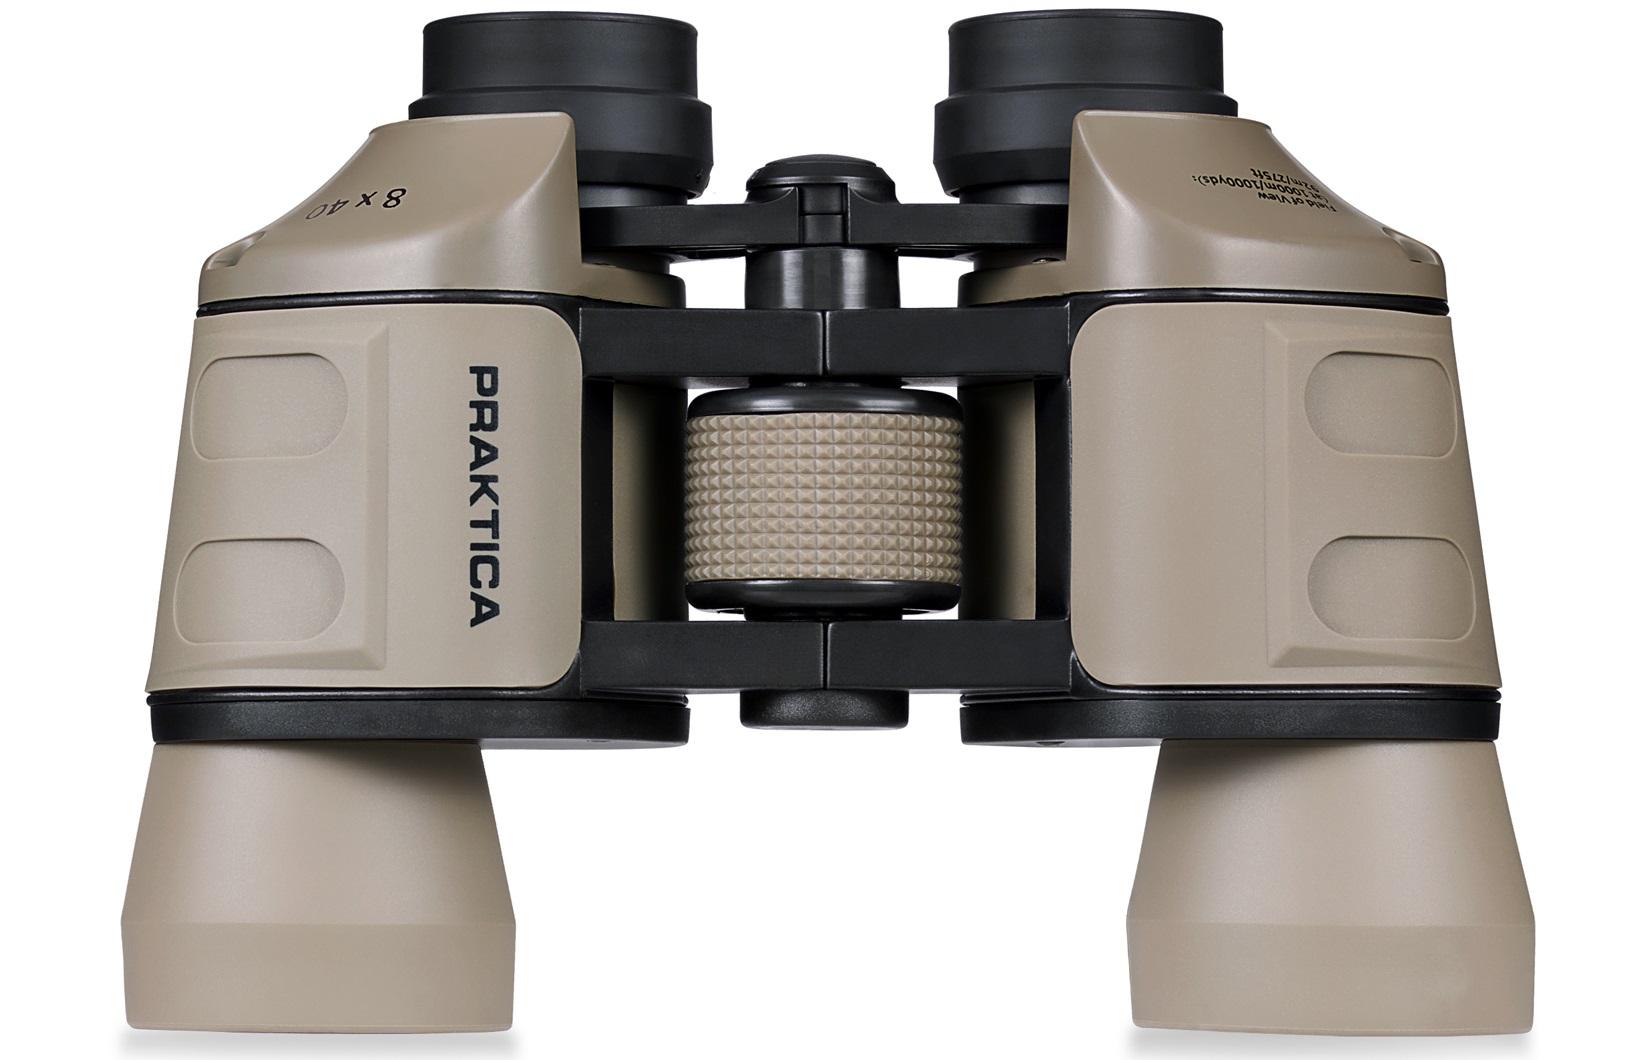 Praktica falcon 8x40 porro prism field binoculars sand pra203 £29.99